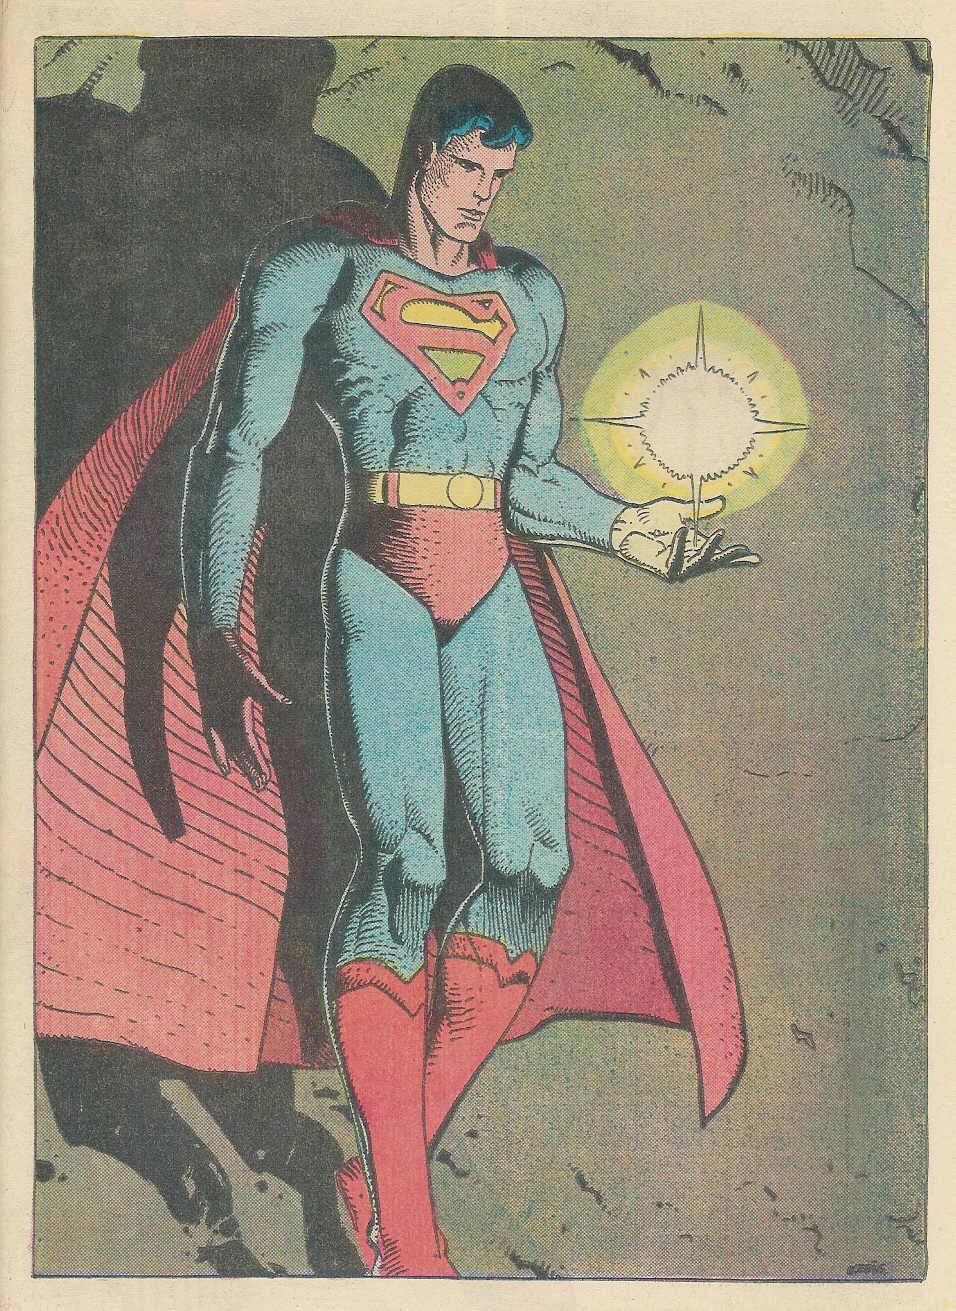 Superman%2B%2523400%2B%25281984%2529%2B-%2BMoebius%2B-%2BArkham%2BComics%2B7%2Brue%2BBroca%2B75005%2BParis